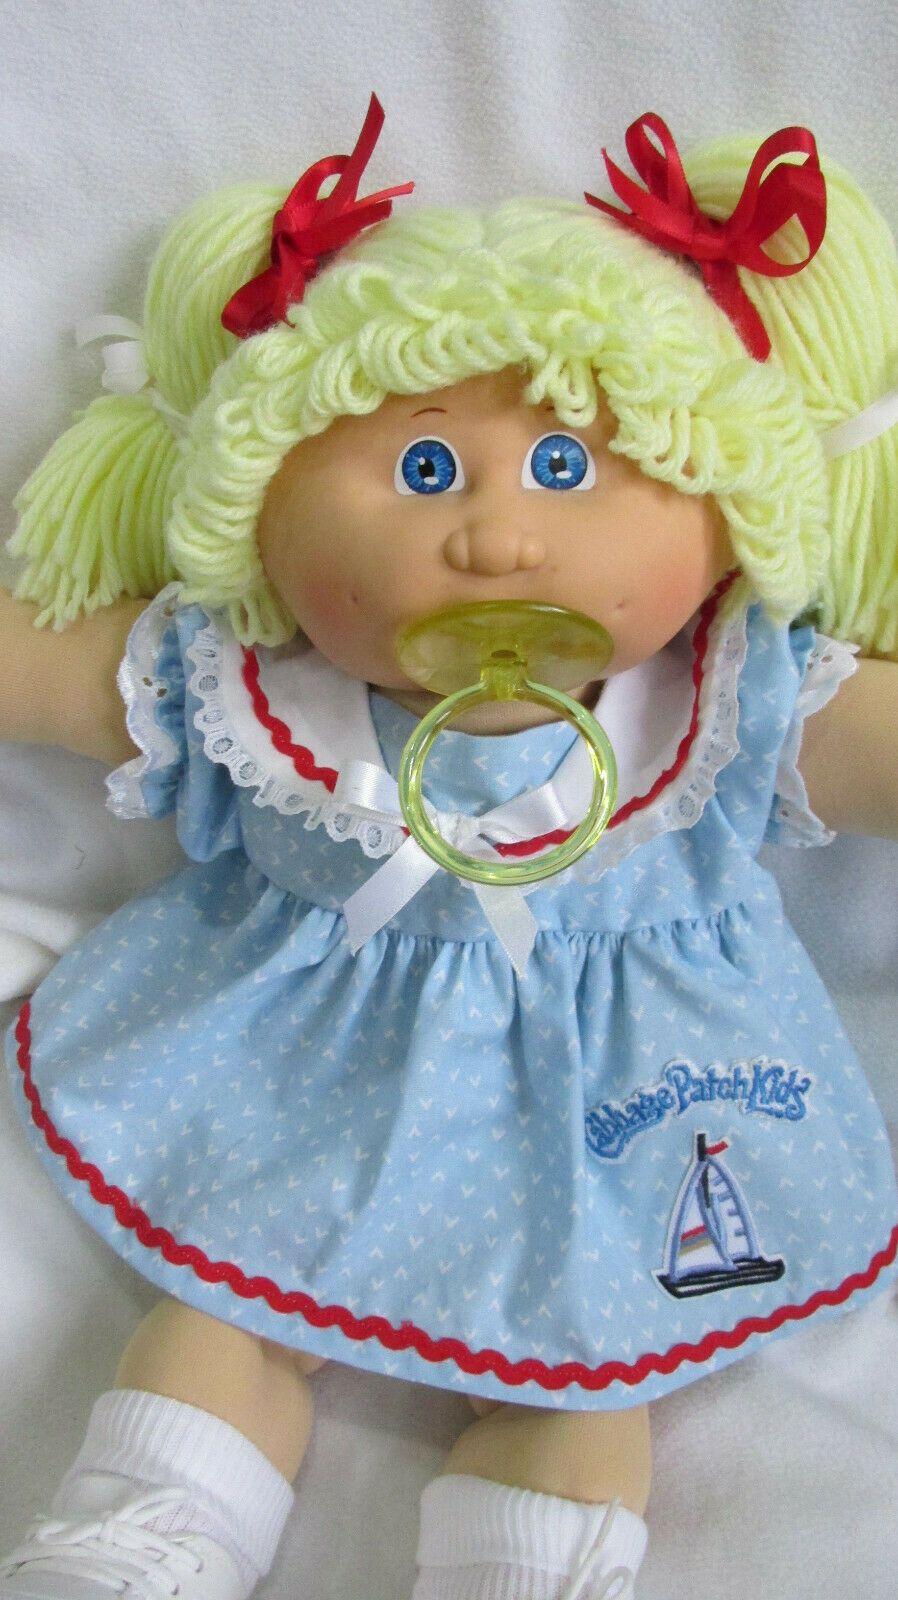 Vintage Original Cabbage Patch Cpk Doll Lemon Blonde Pacifier Girl Hm 4 Ebay Vintage Cabbage Patch Dolls Cabbage Patch Kids Dolls Pacifier Girl